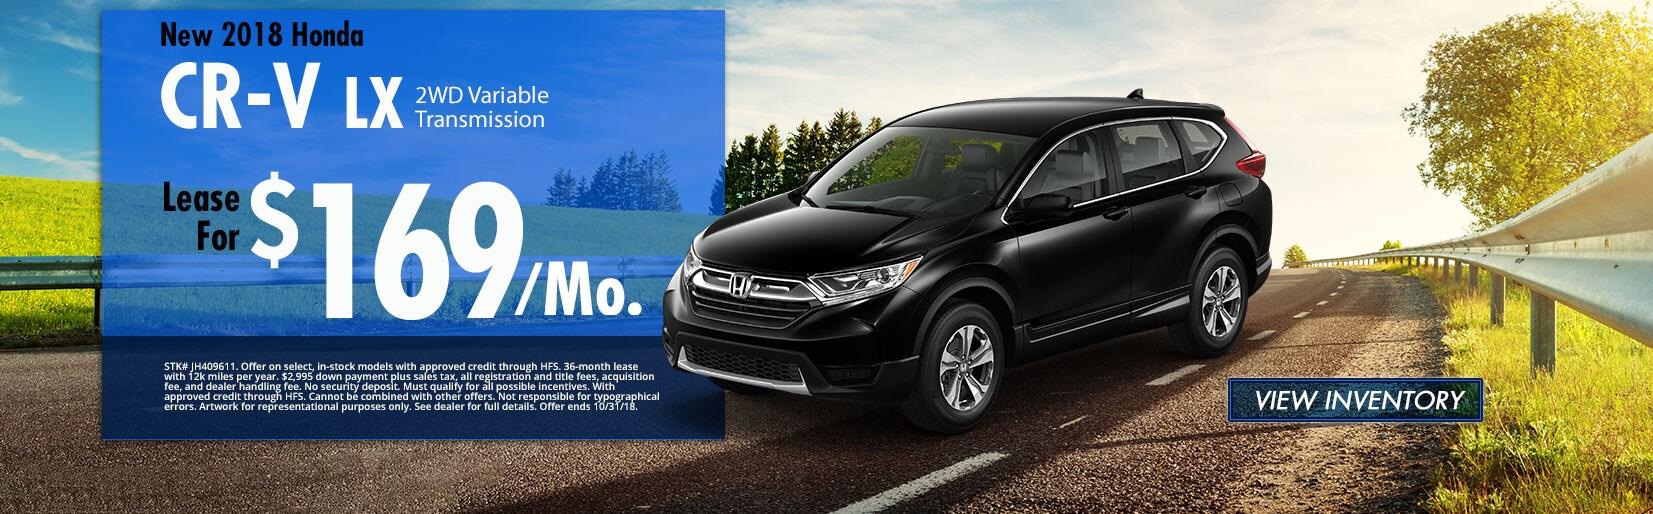 Honda Dealership Near Me >> Coconut Point Honda, New & Used Honda Dealership in Estero ...